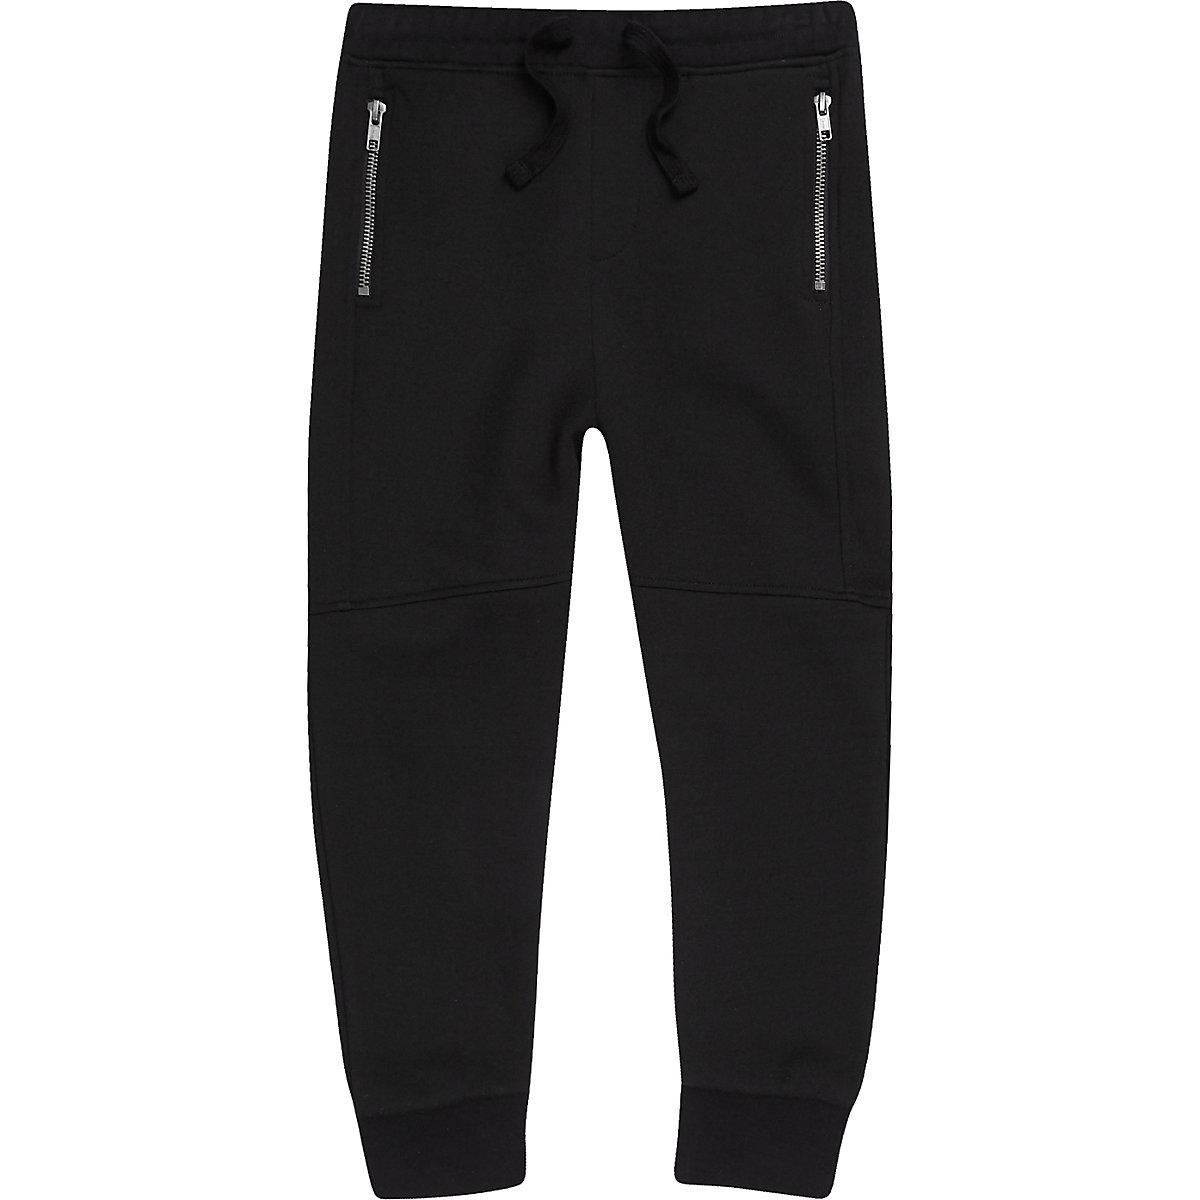 Schwarze Jogginghose mit Bahnen